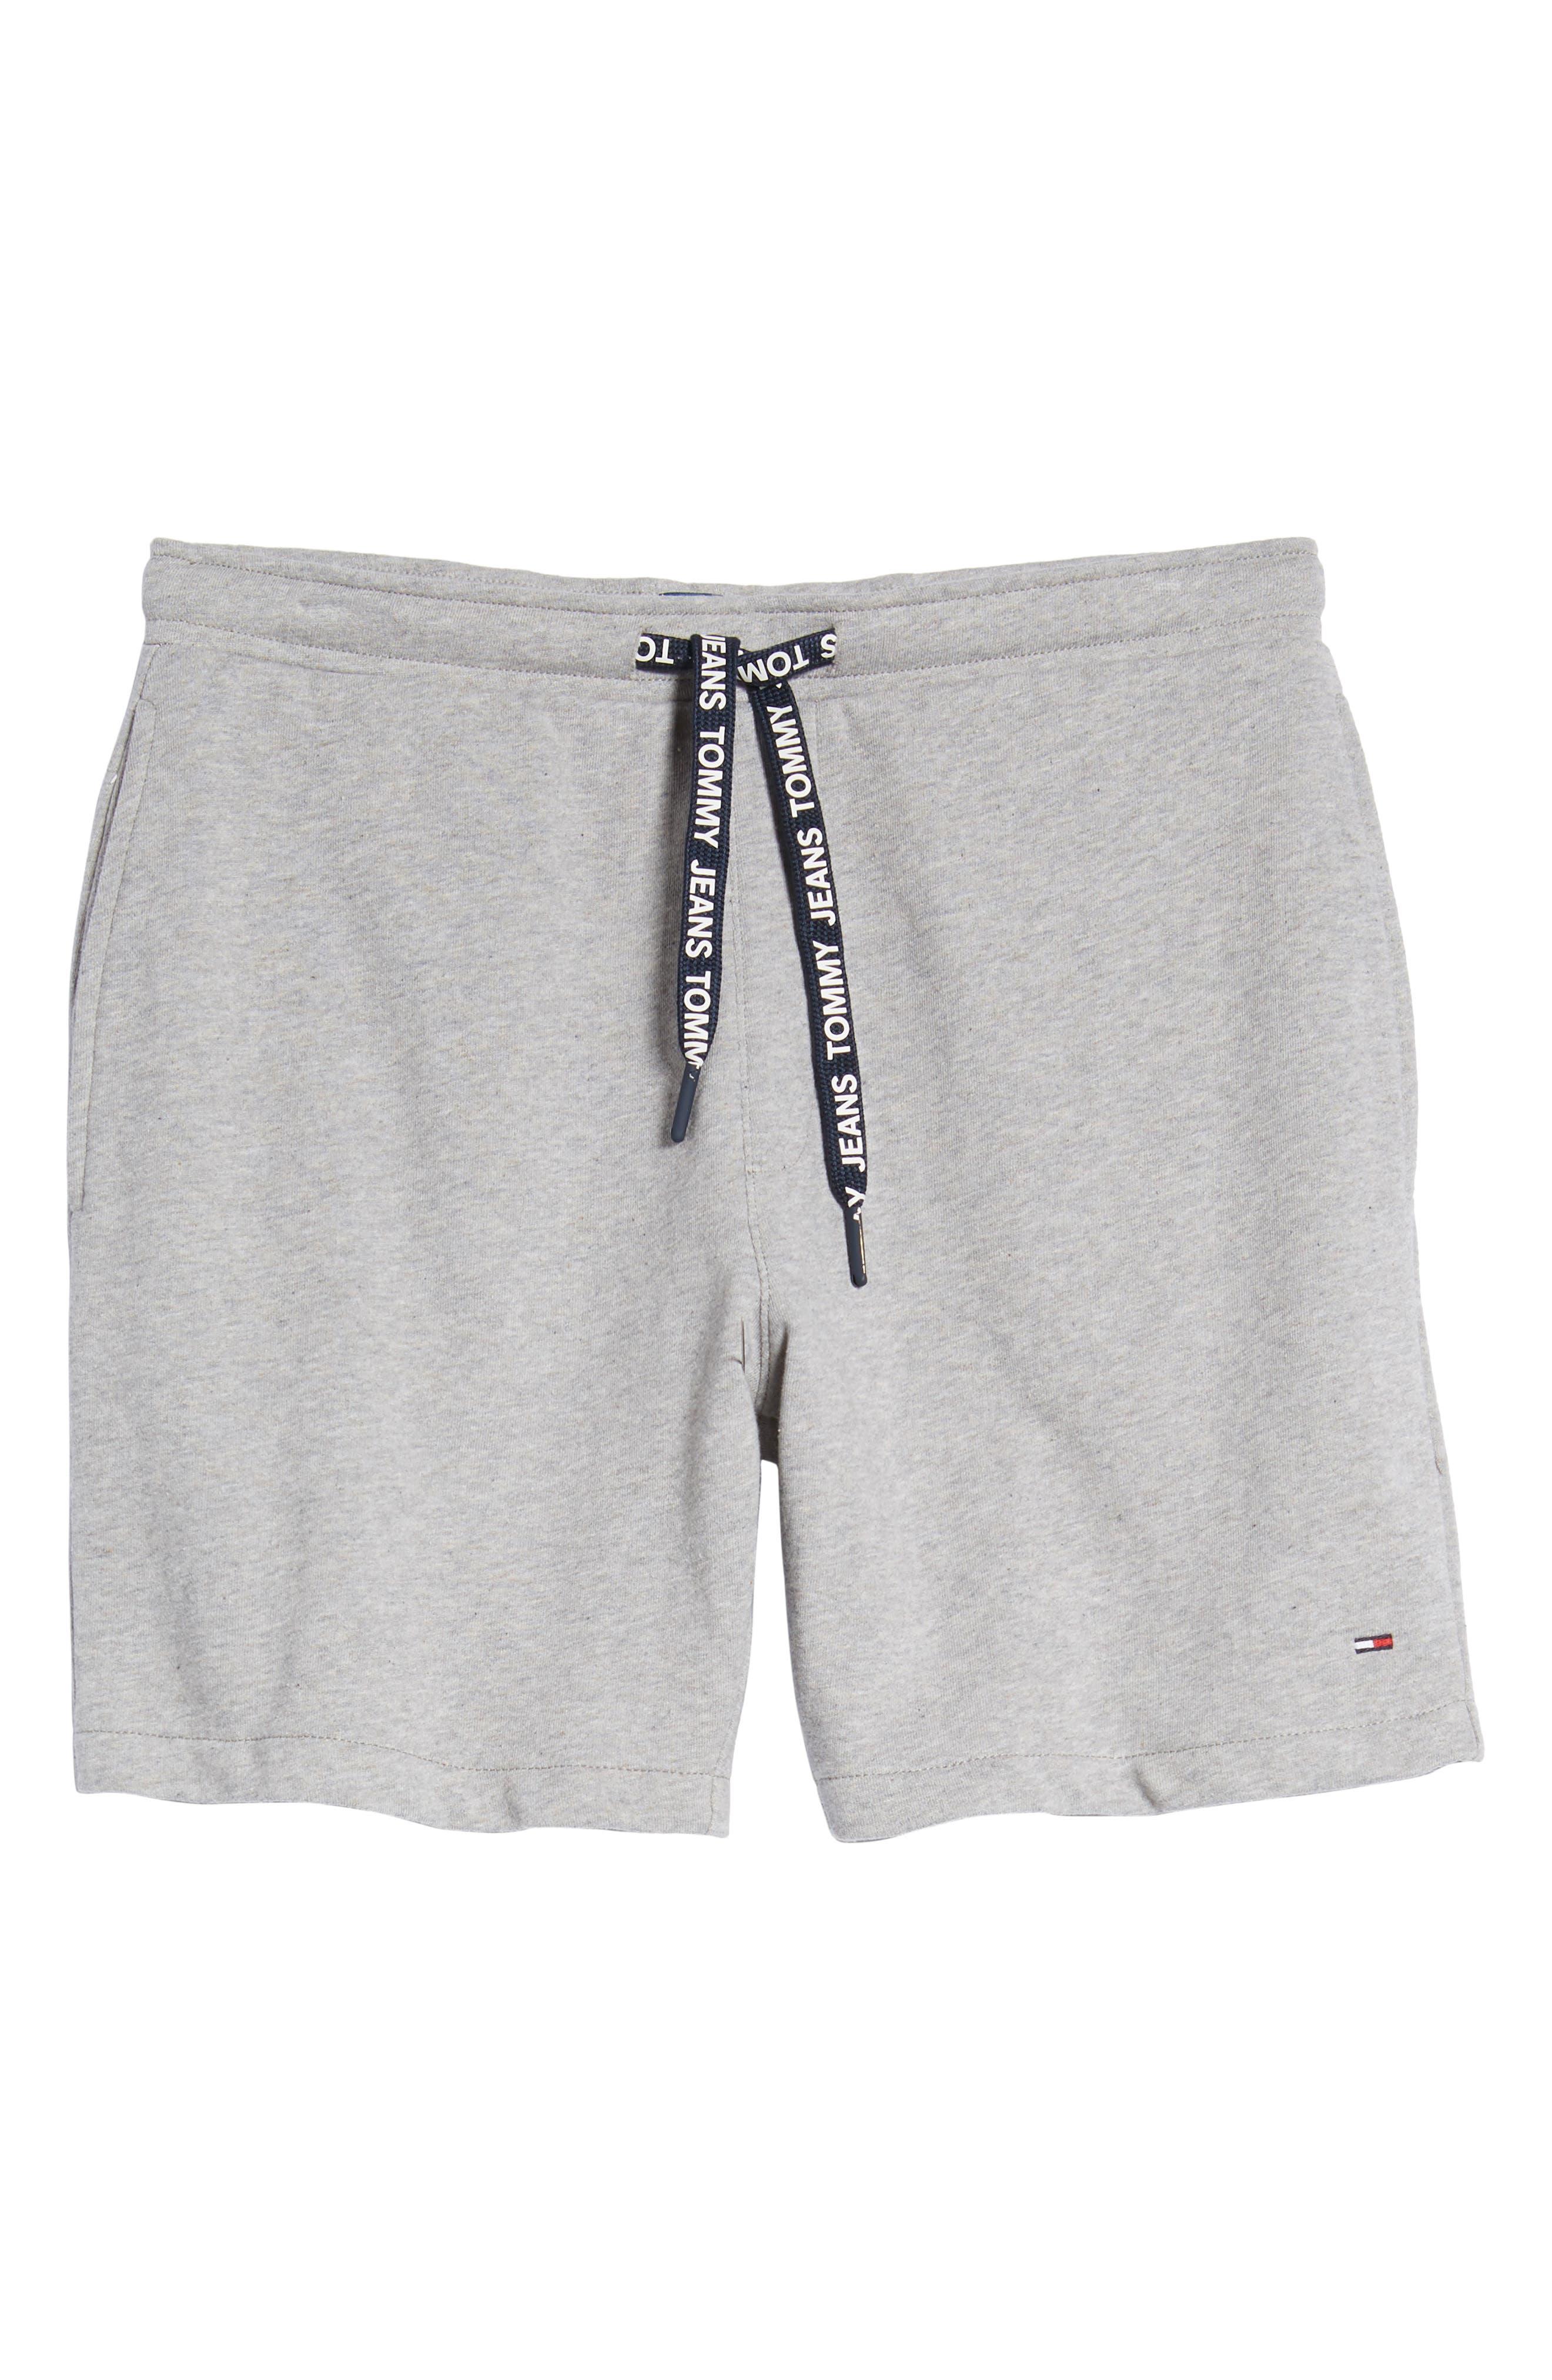 Sweat Shorts,                             Alternate thumbnail 6, color,                             038